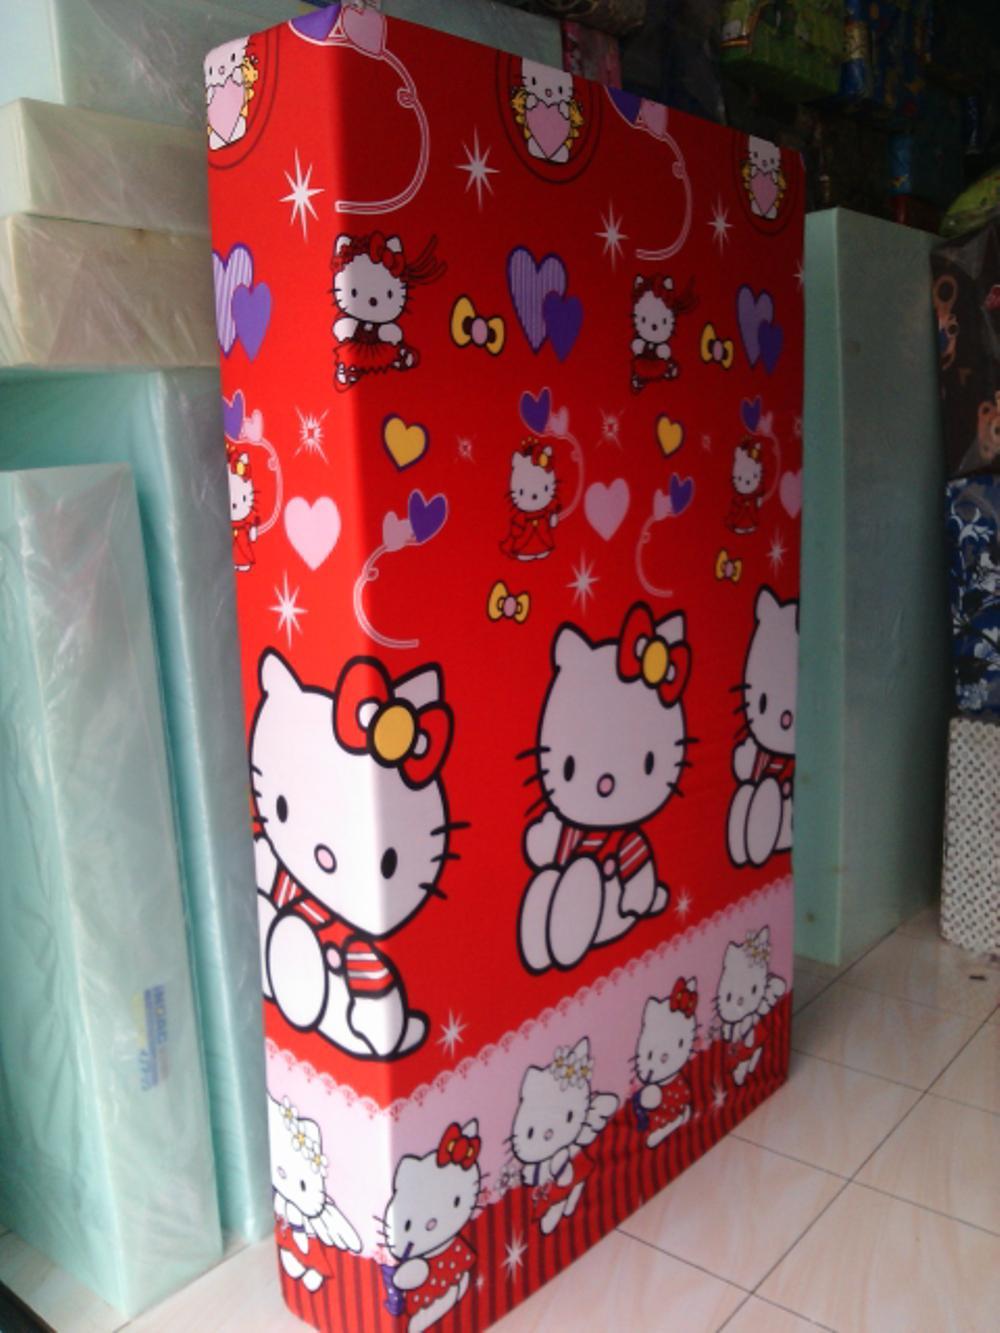 Jual Kasur Busa Inoac Di Tangerang Distributor Kasur Inoac